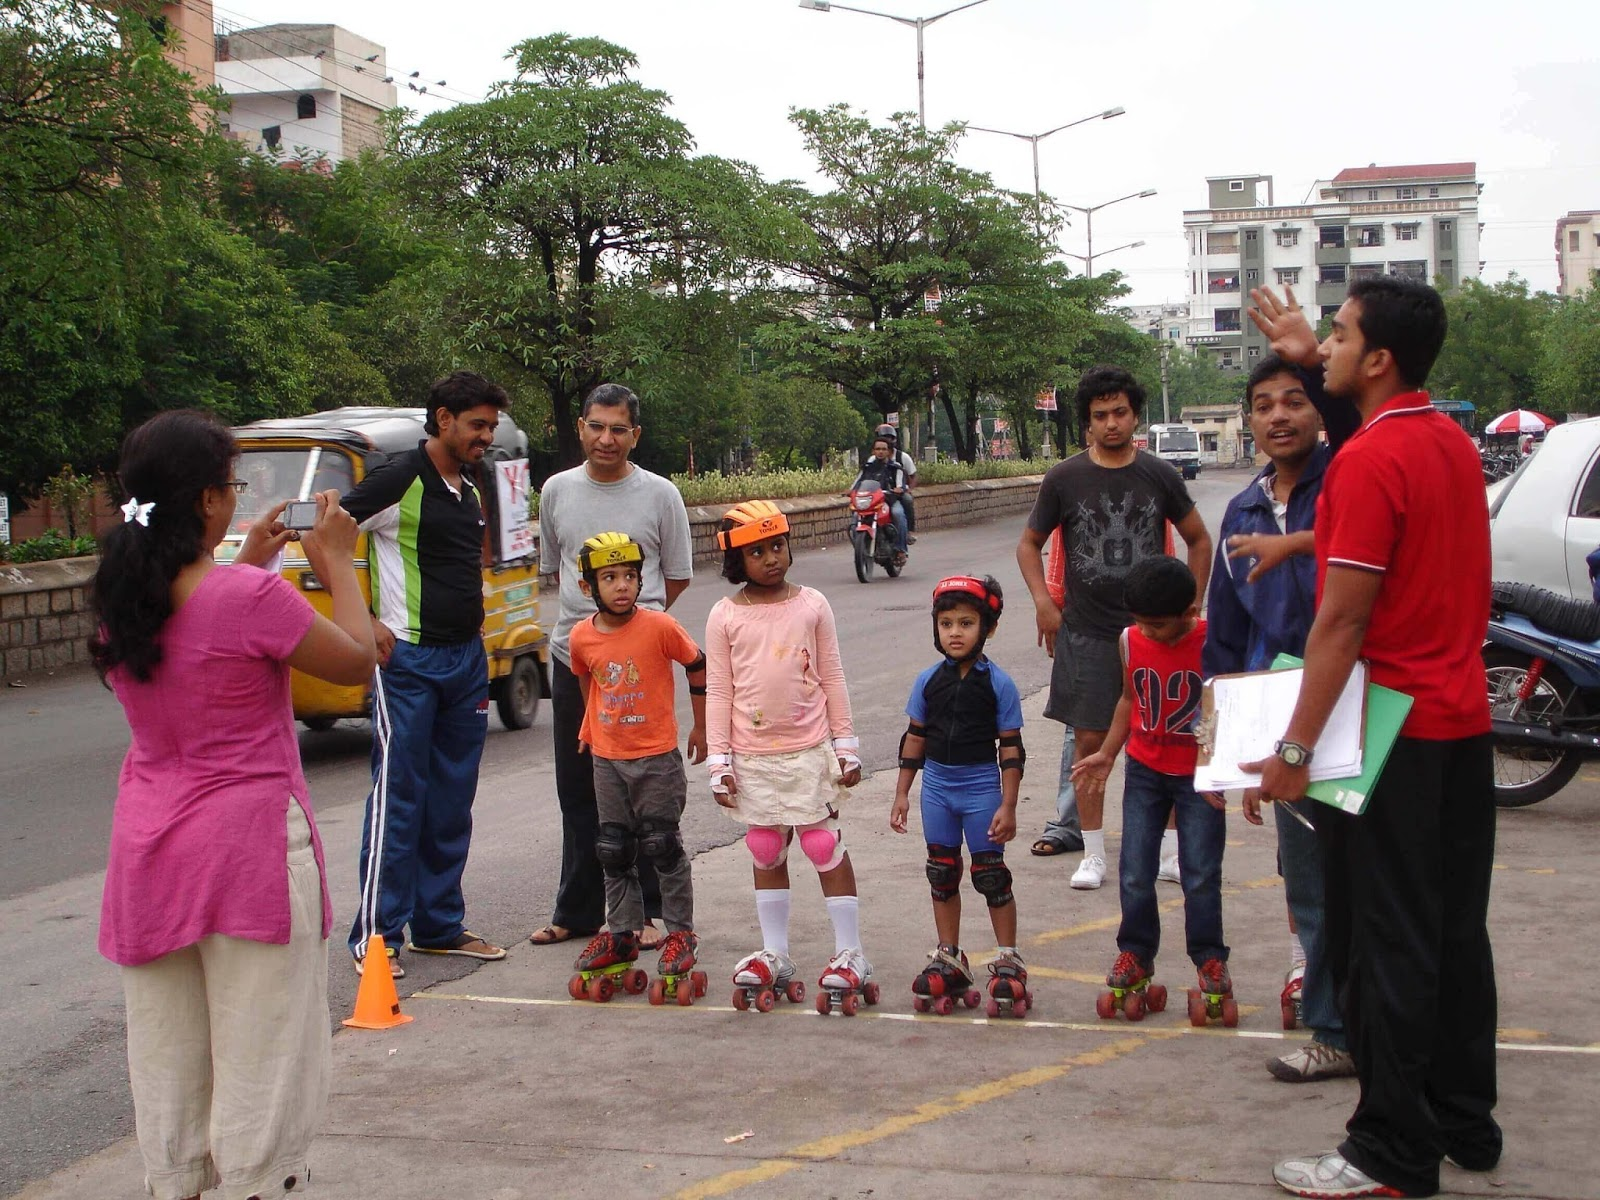 Roller shoes in hyderabad - Skating Classes At Ameerpet In Hyderabad Vans Skate Shoes Adult Roller Skates Aggressive Skates Kids Inline